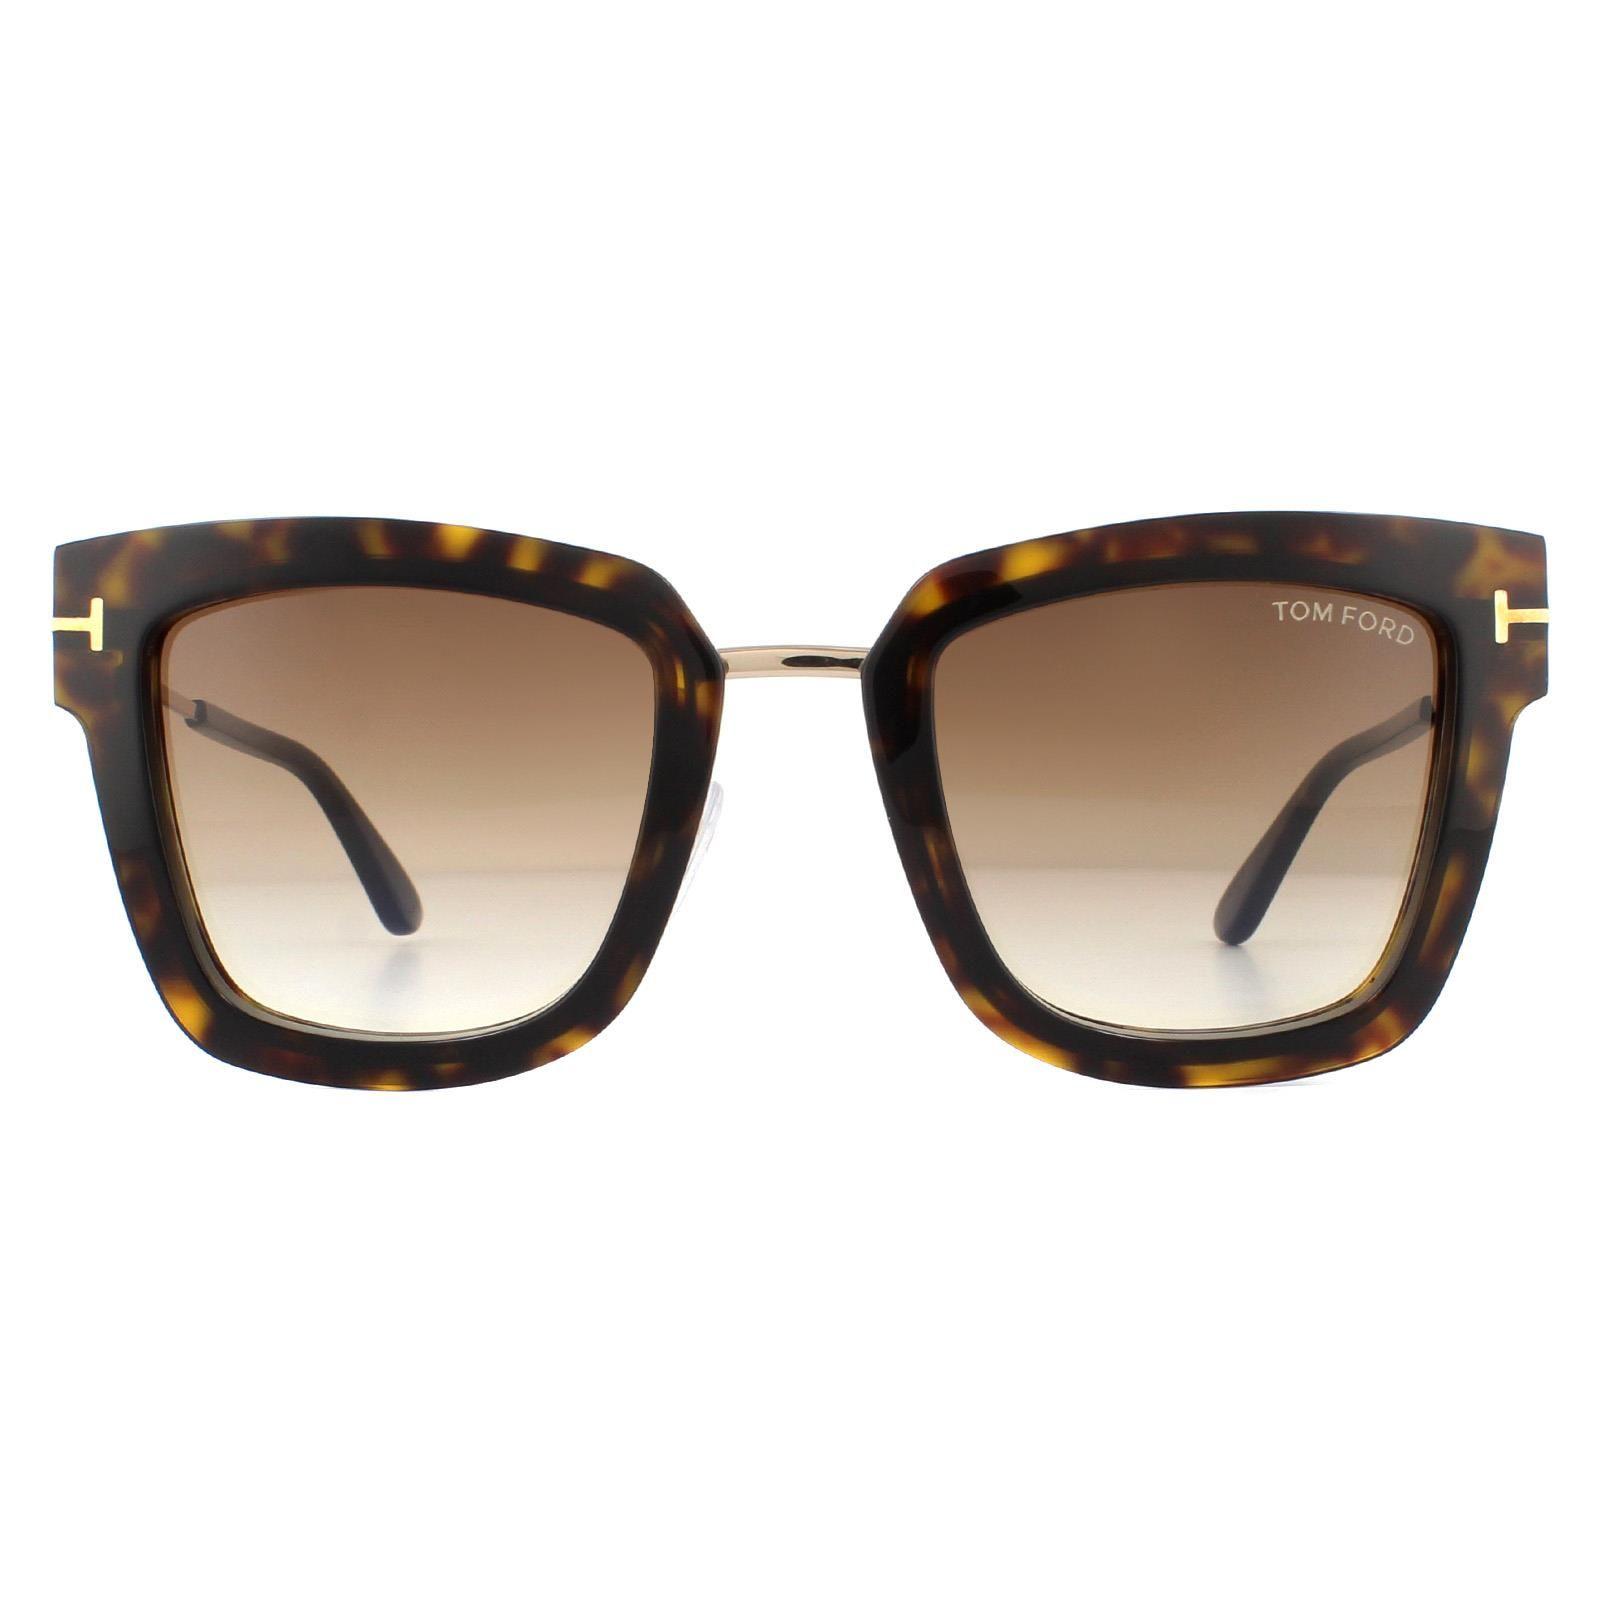 Tom Ford Sunglasses Lara FT0573 52F Dark Havana Rose Gold Brown Gradient